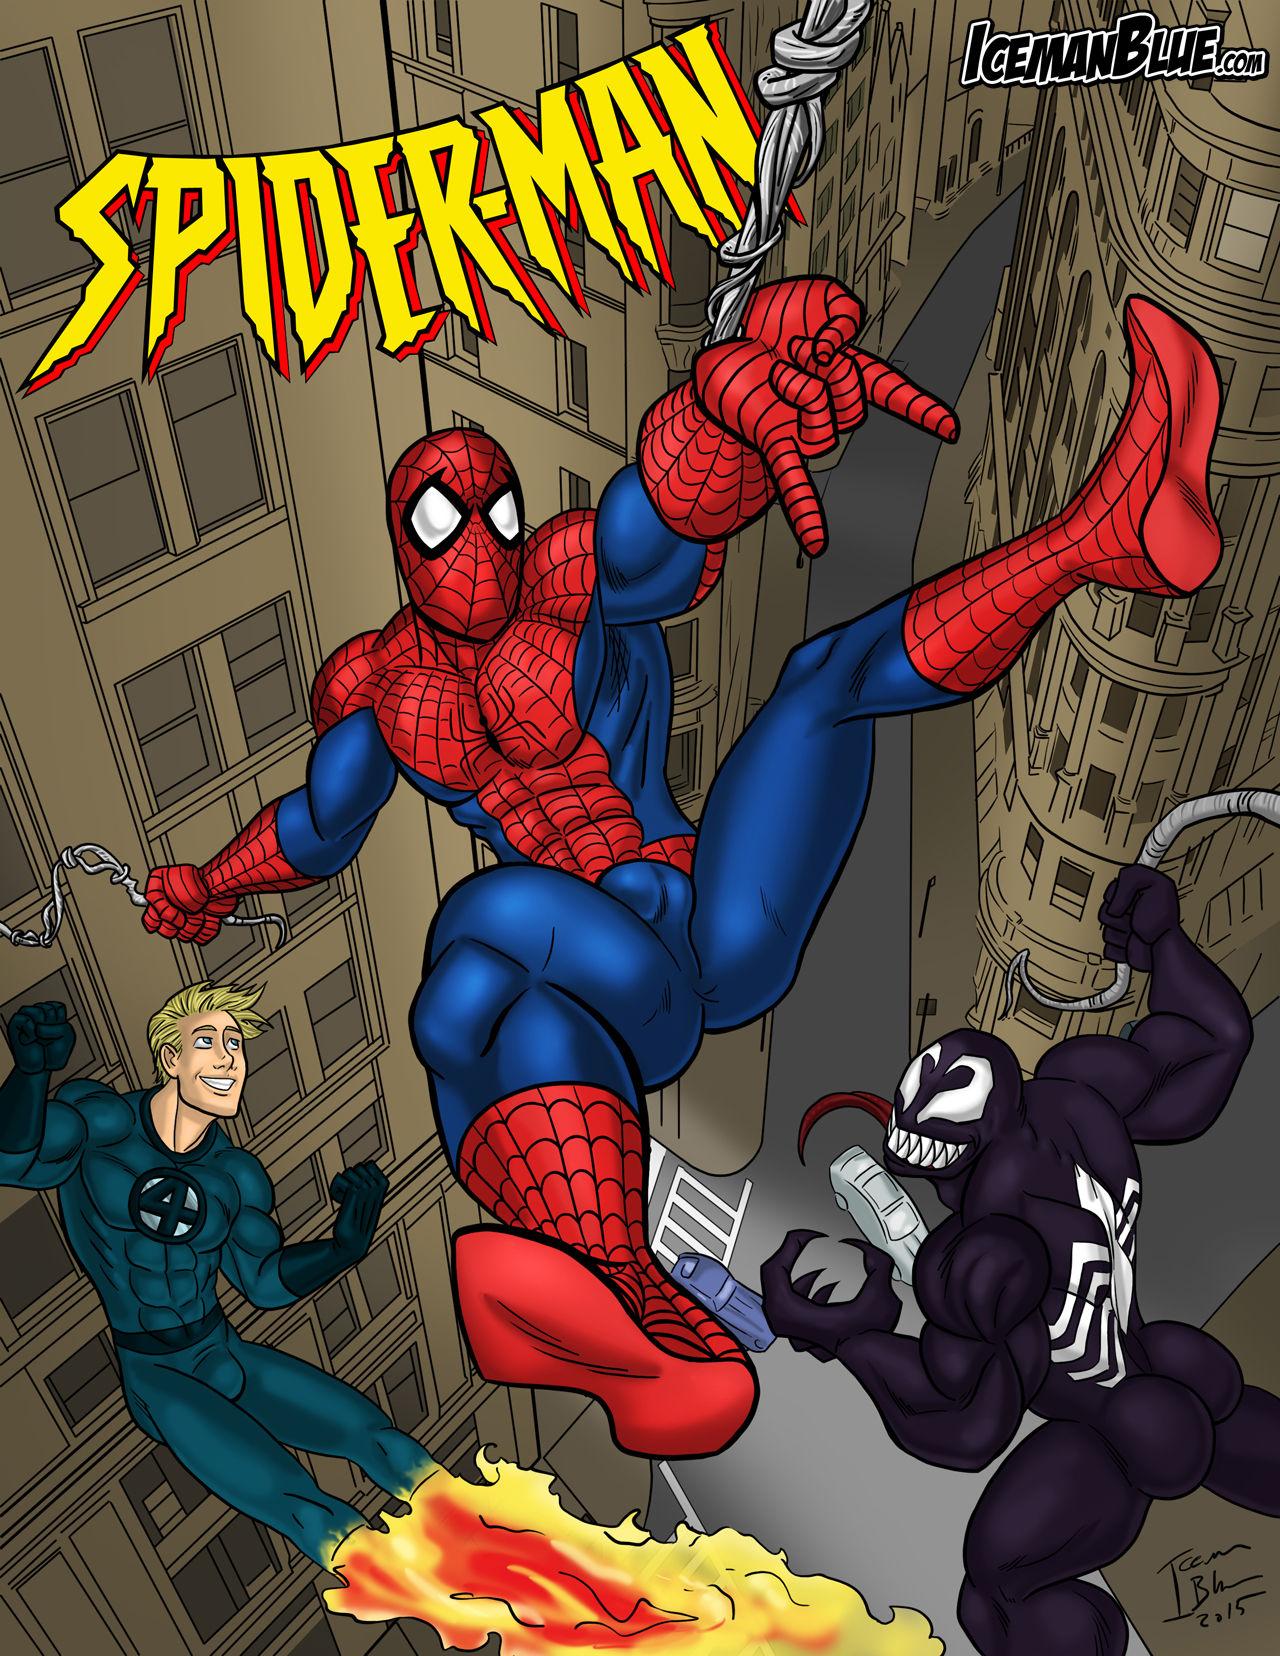 Spider-Man- Iceman Blue porn comics 8 muses